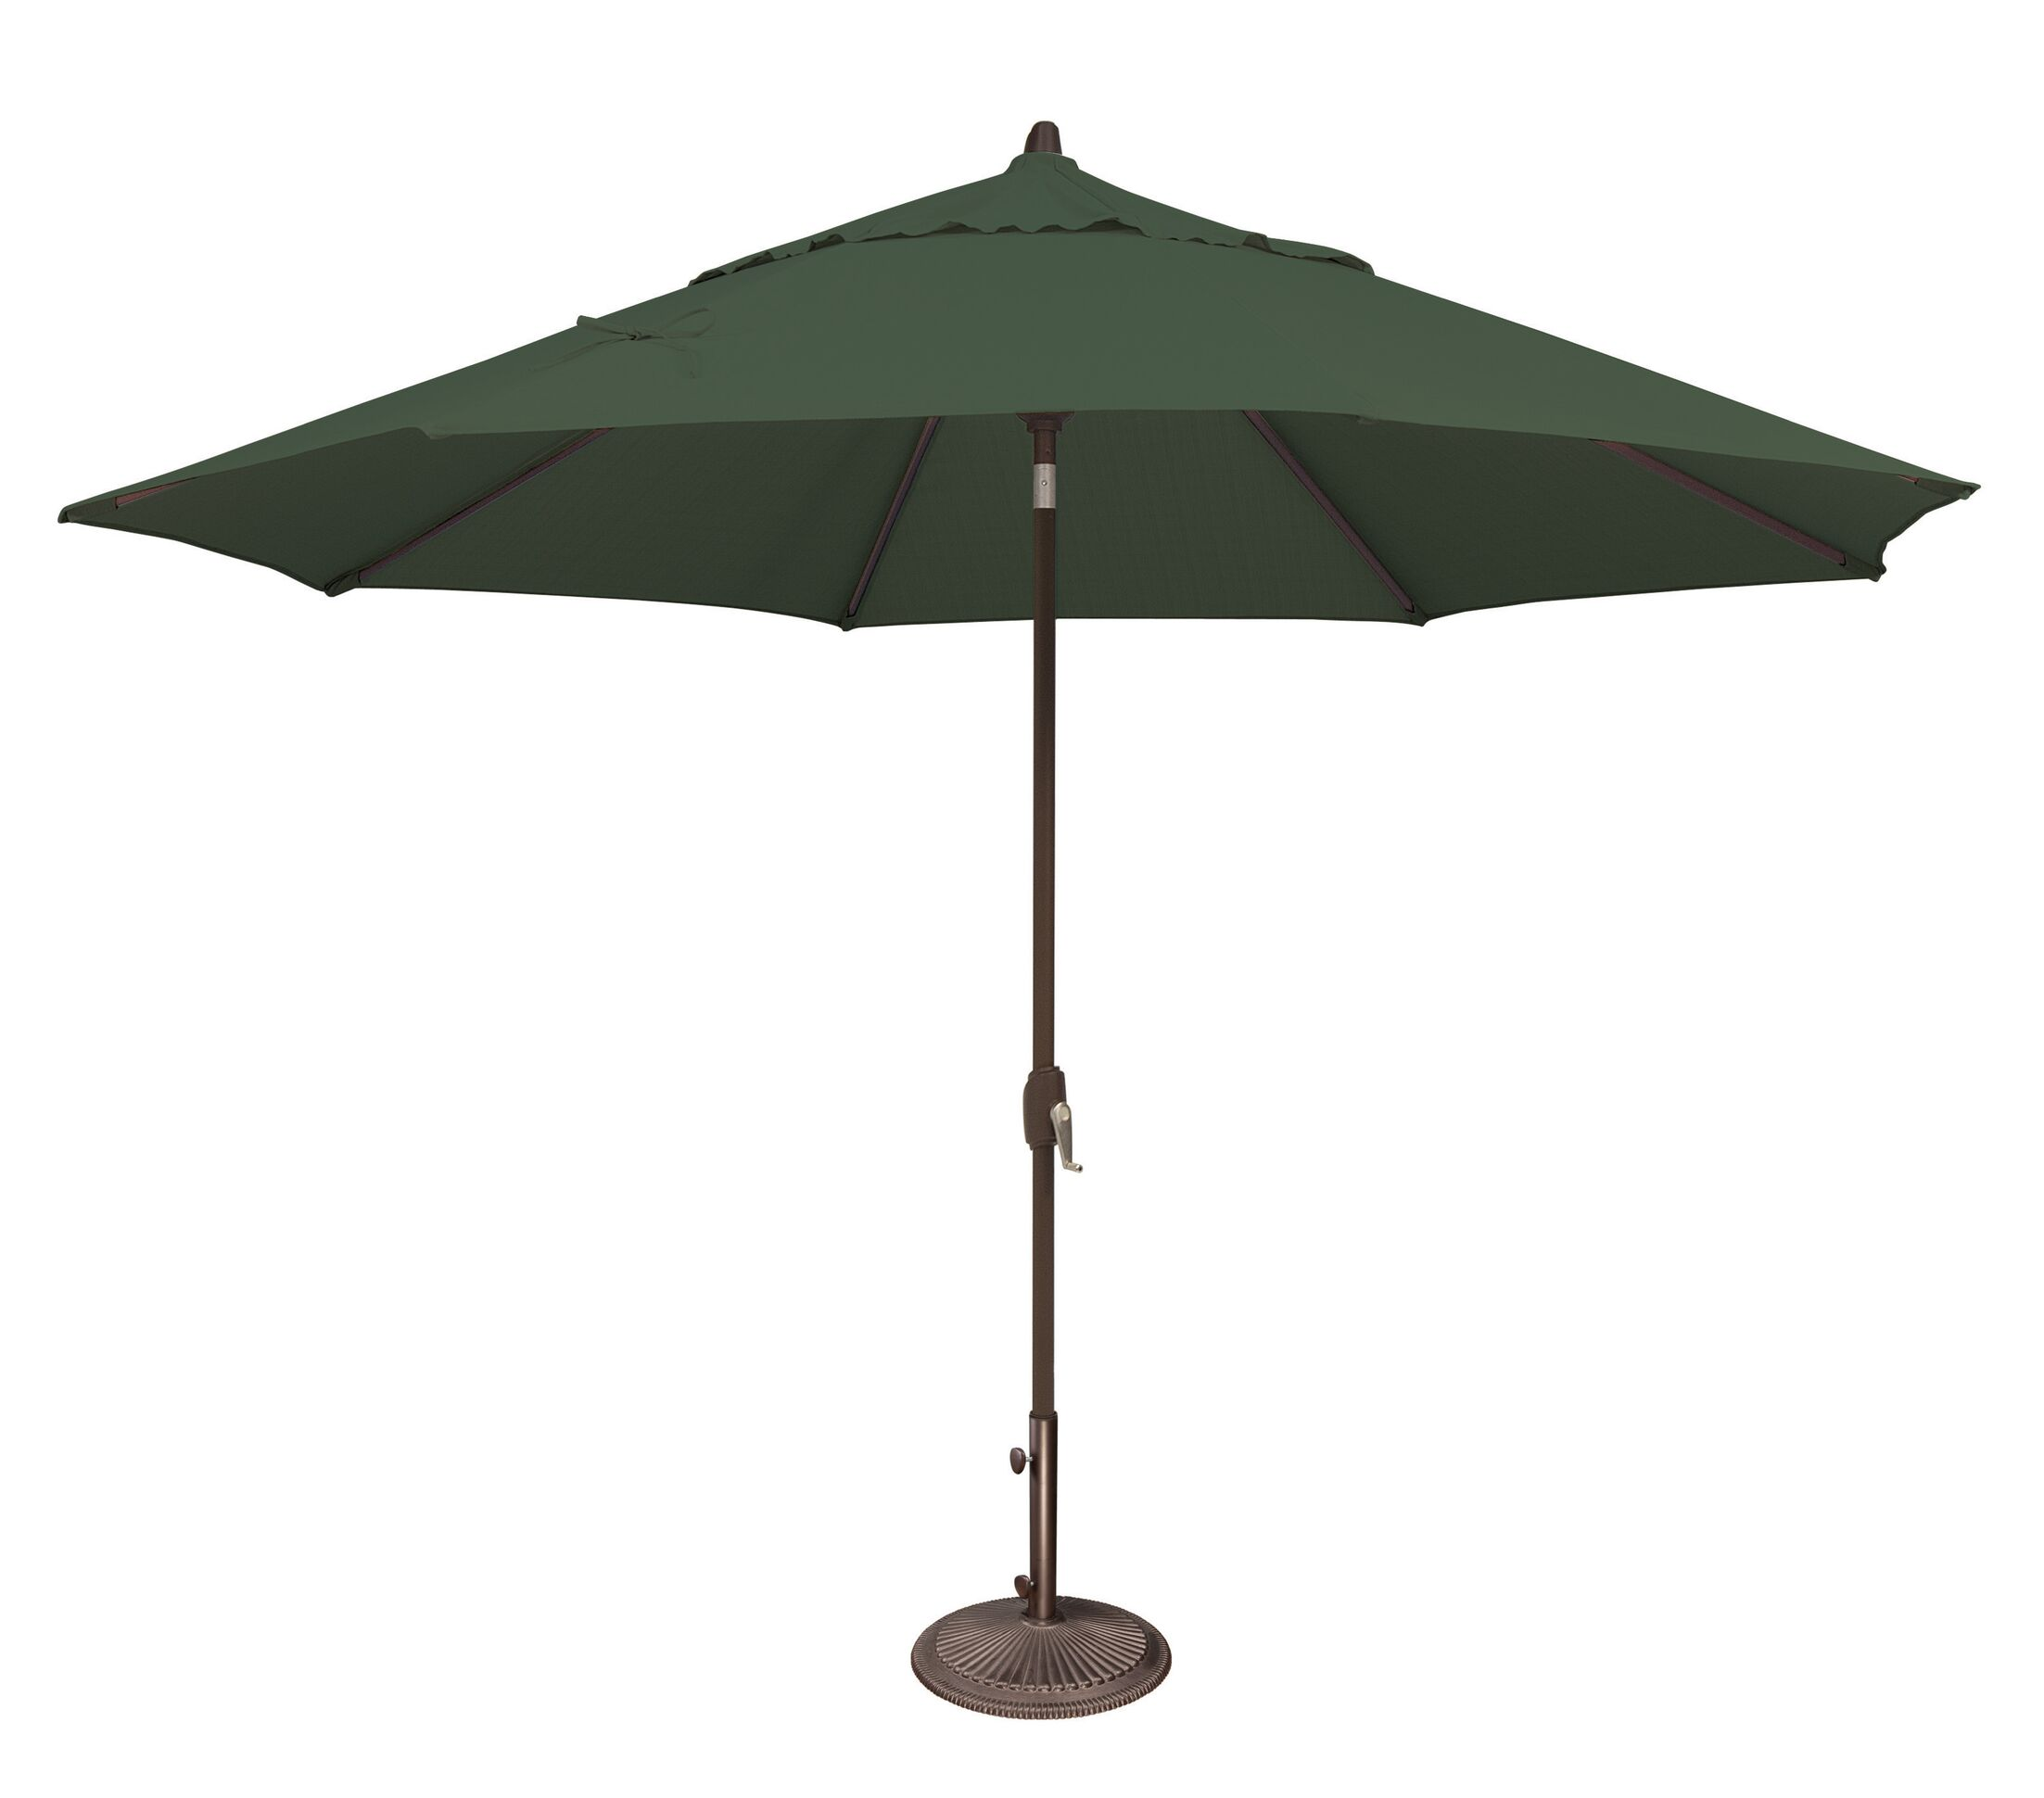 Lanai 11' Market Umbrella Fabric: Solefin / Forest Green